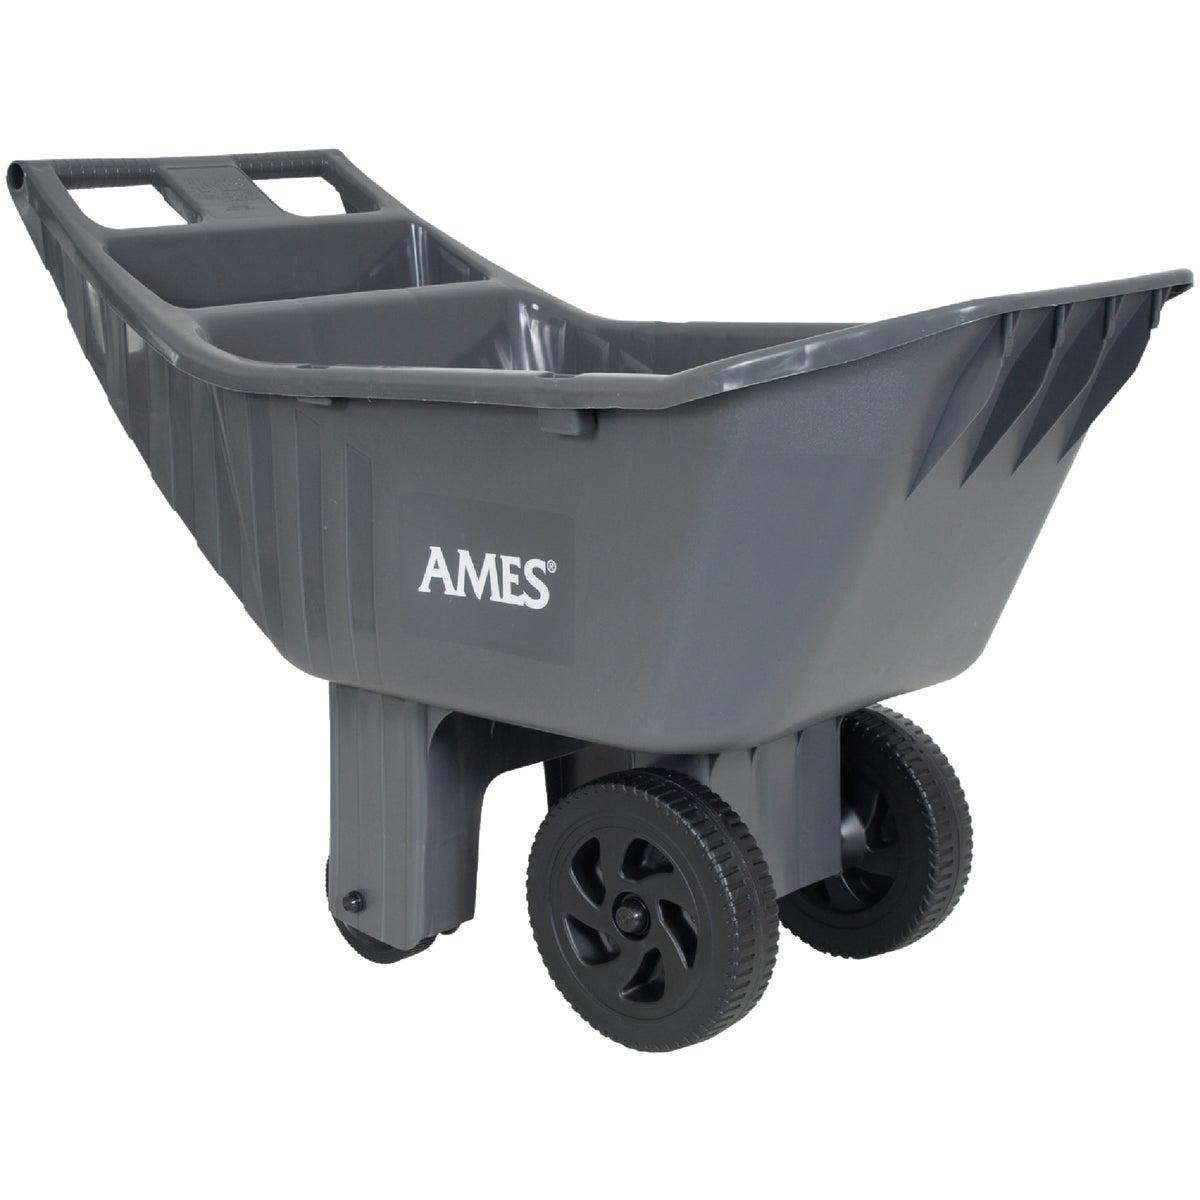 Ames Co. 4CU FT POLY GARDEN CART 2463875